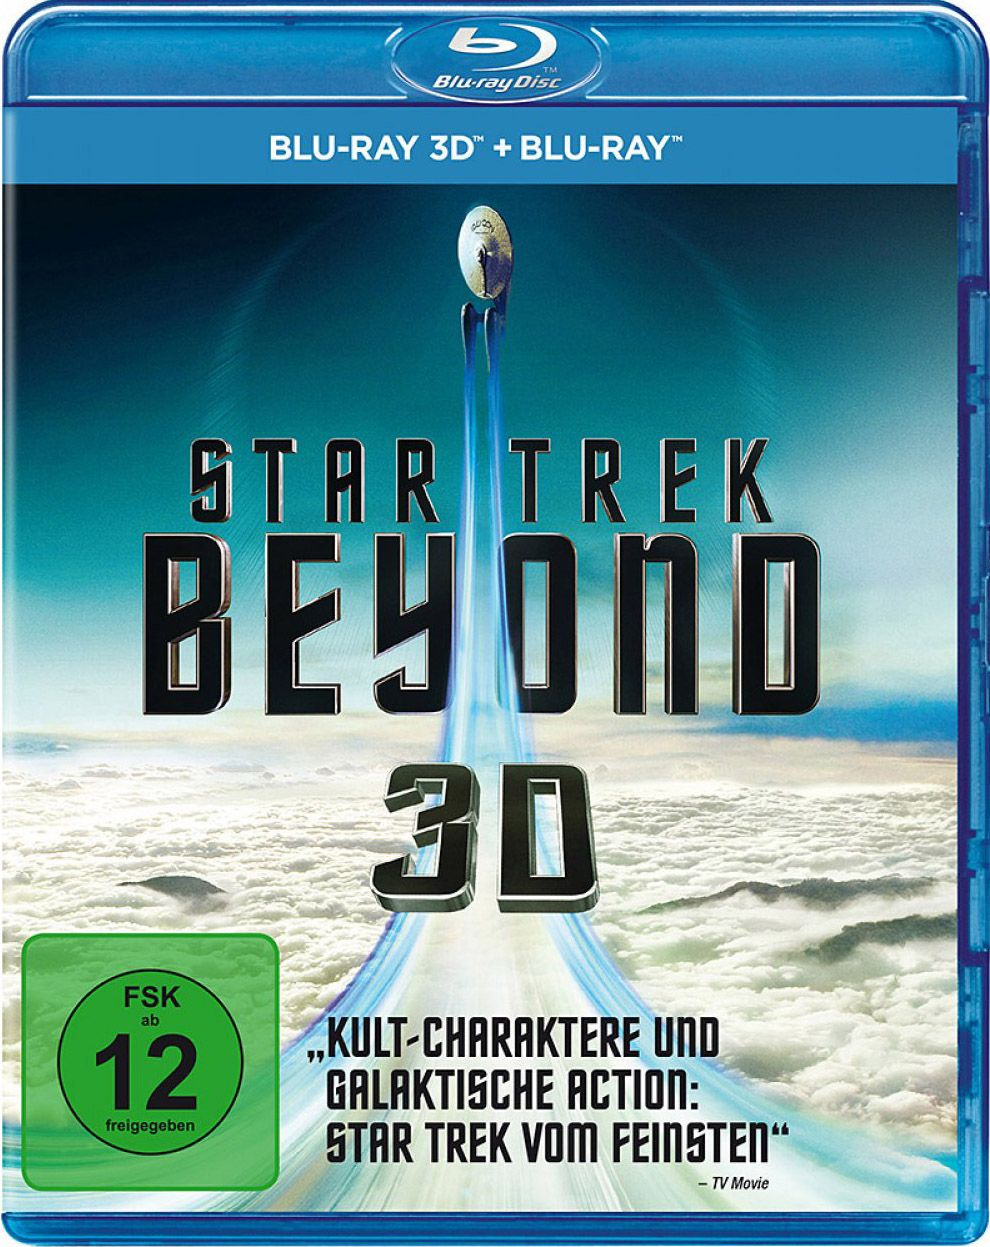 Star Trek - Beyond (2 Discs) (BLURAY 3D + BLURAY)